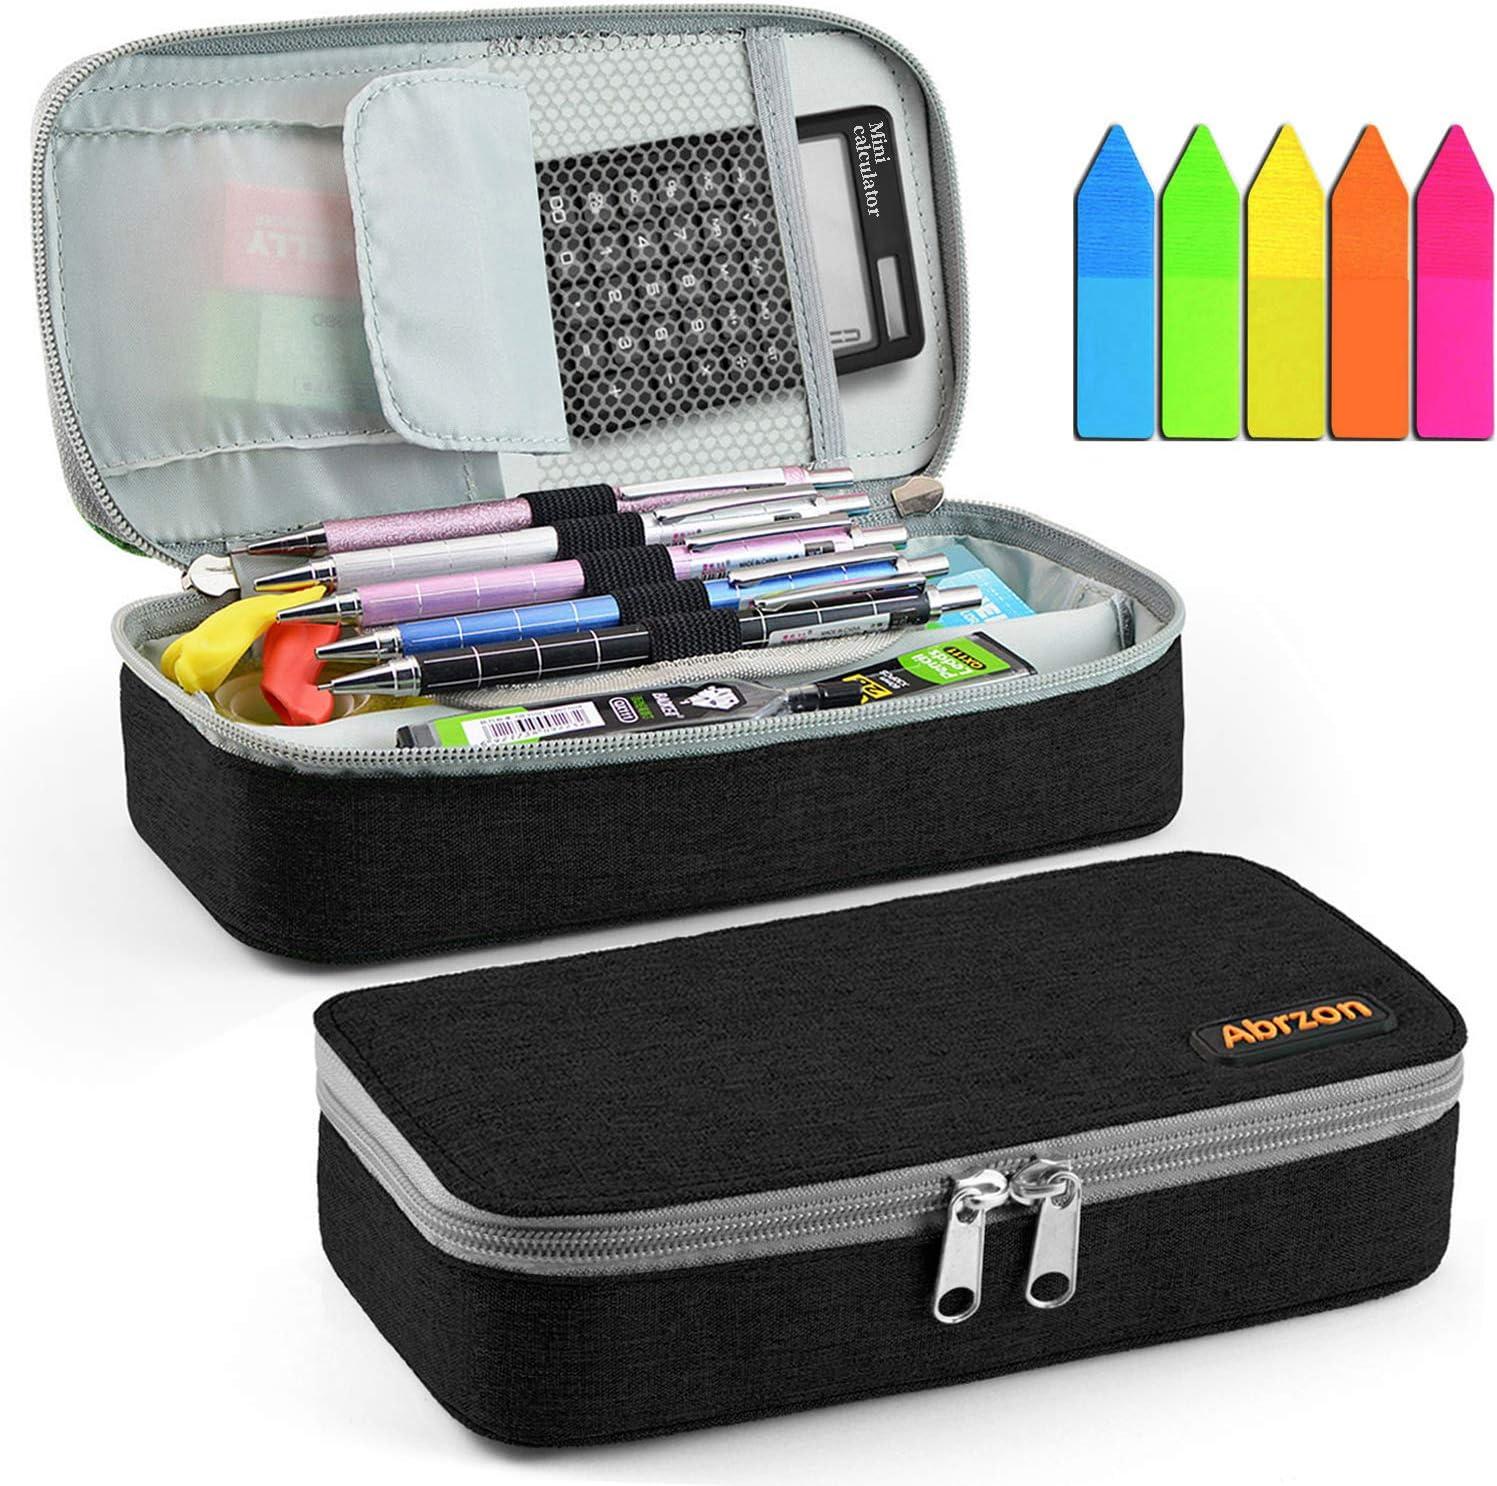 Pencil Case, Abrzon Big Capacity Pen Case Desk Organizer with Zipper for School & Office Supplies - 8.74x4.3x2.17 inches, Black